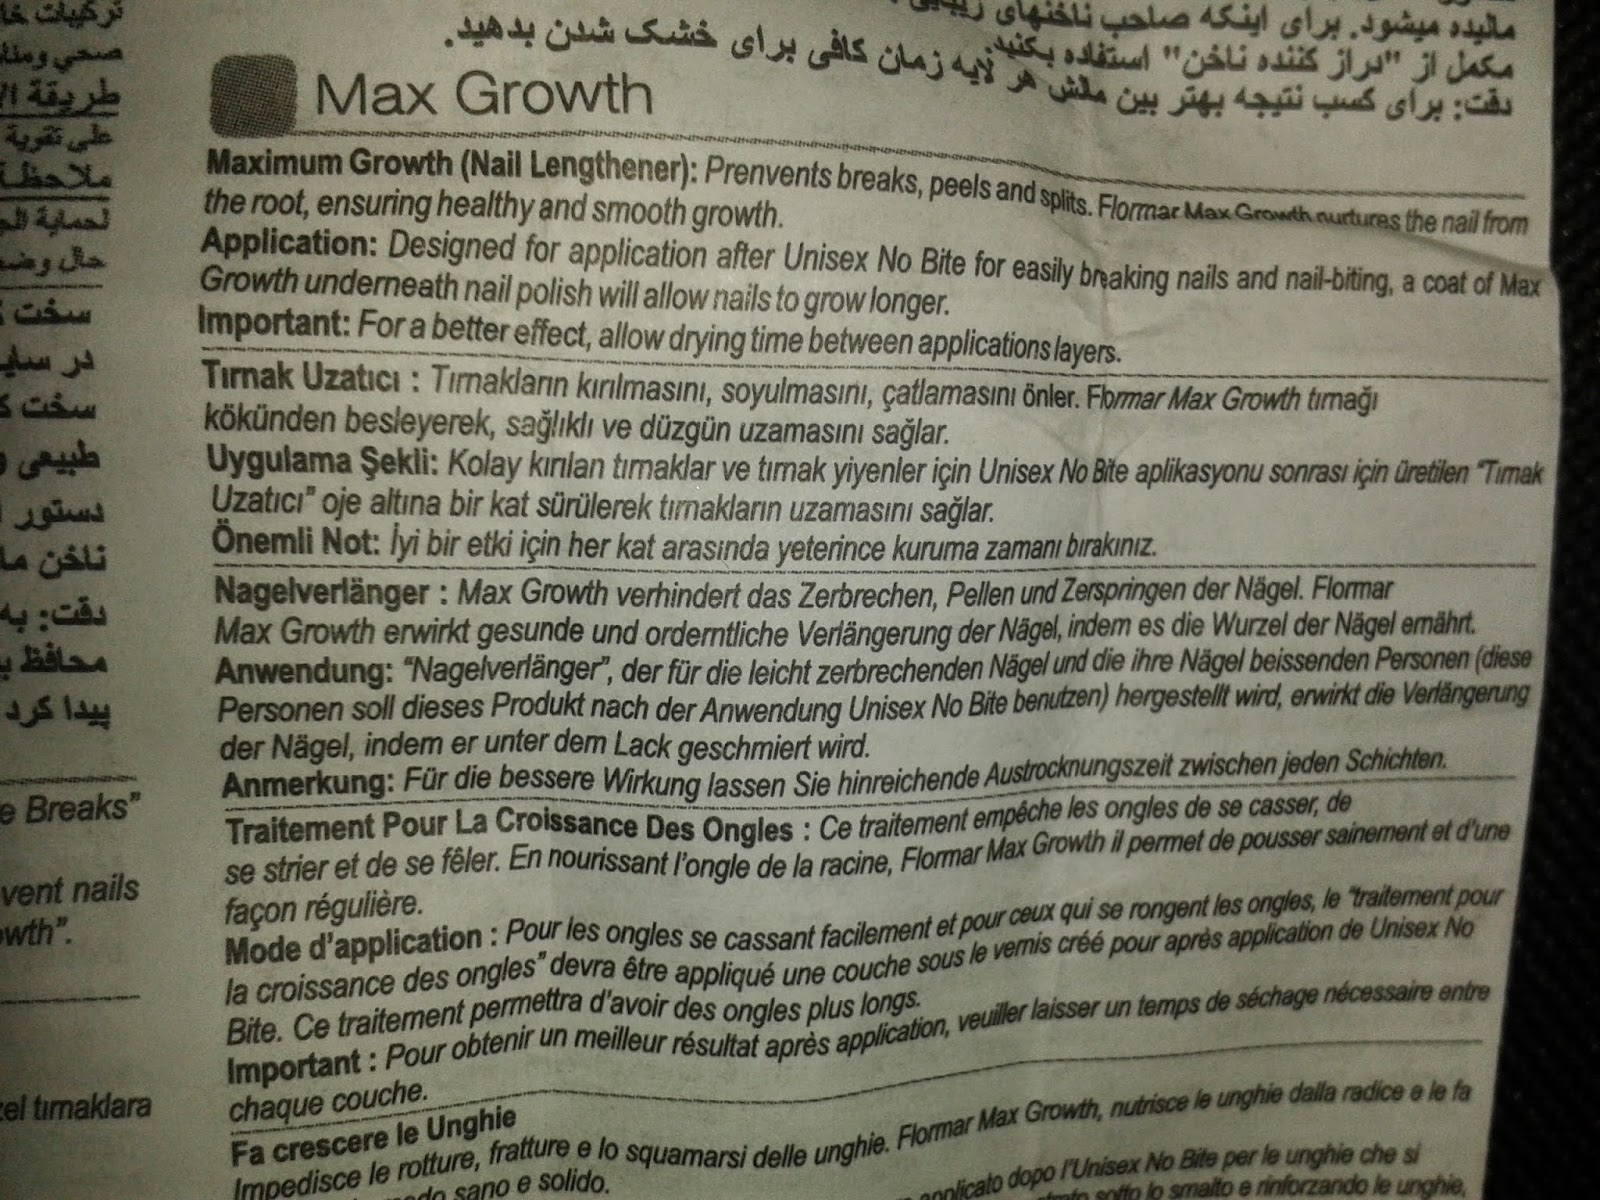 Flormar-max growth-tırnak uzatıcı